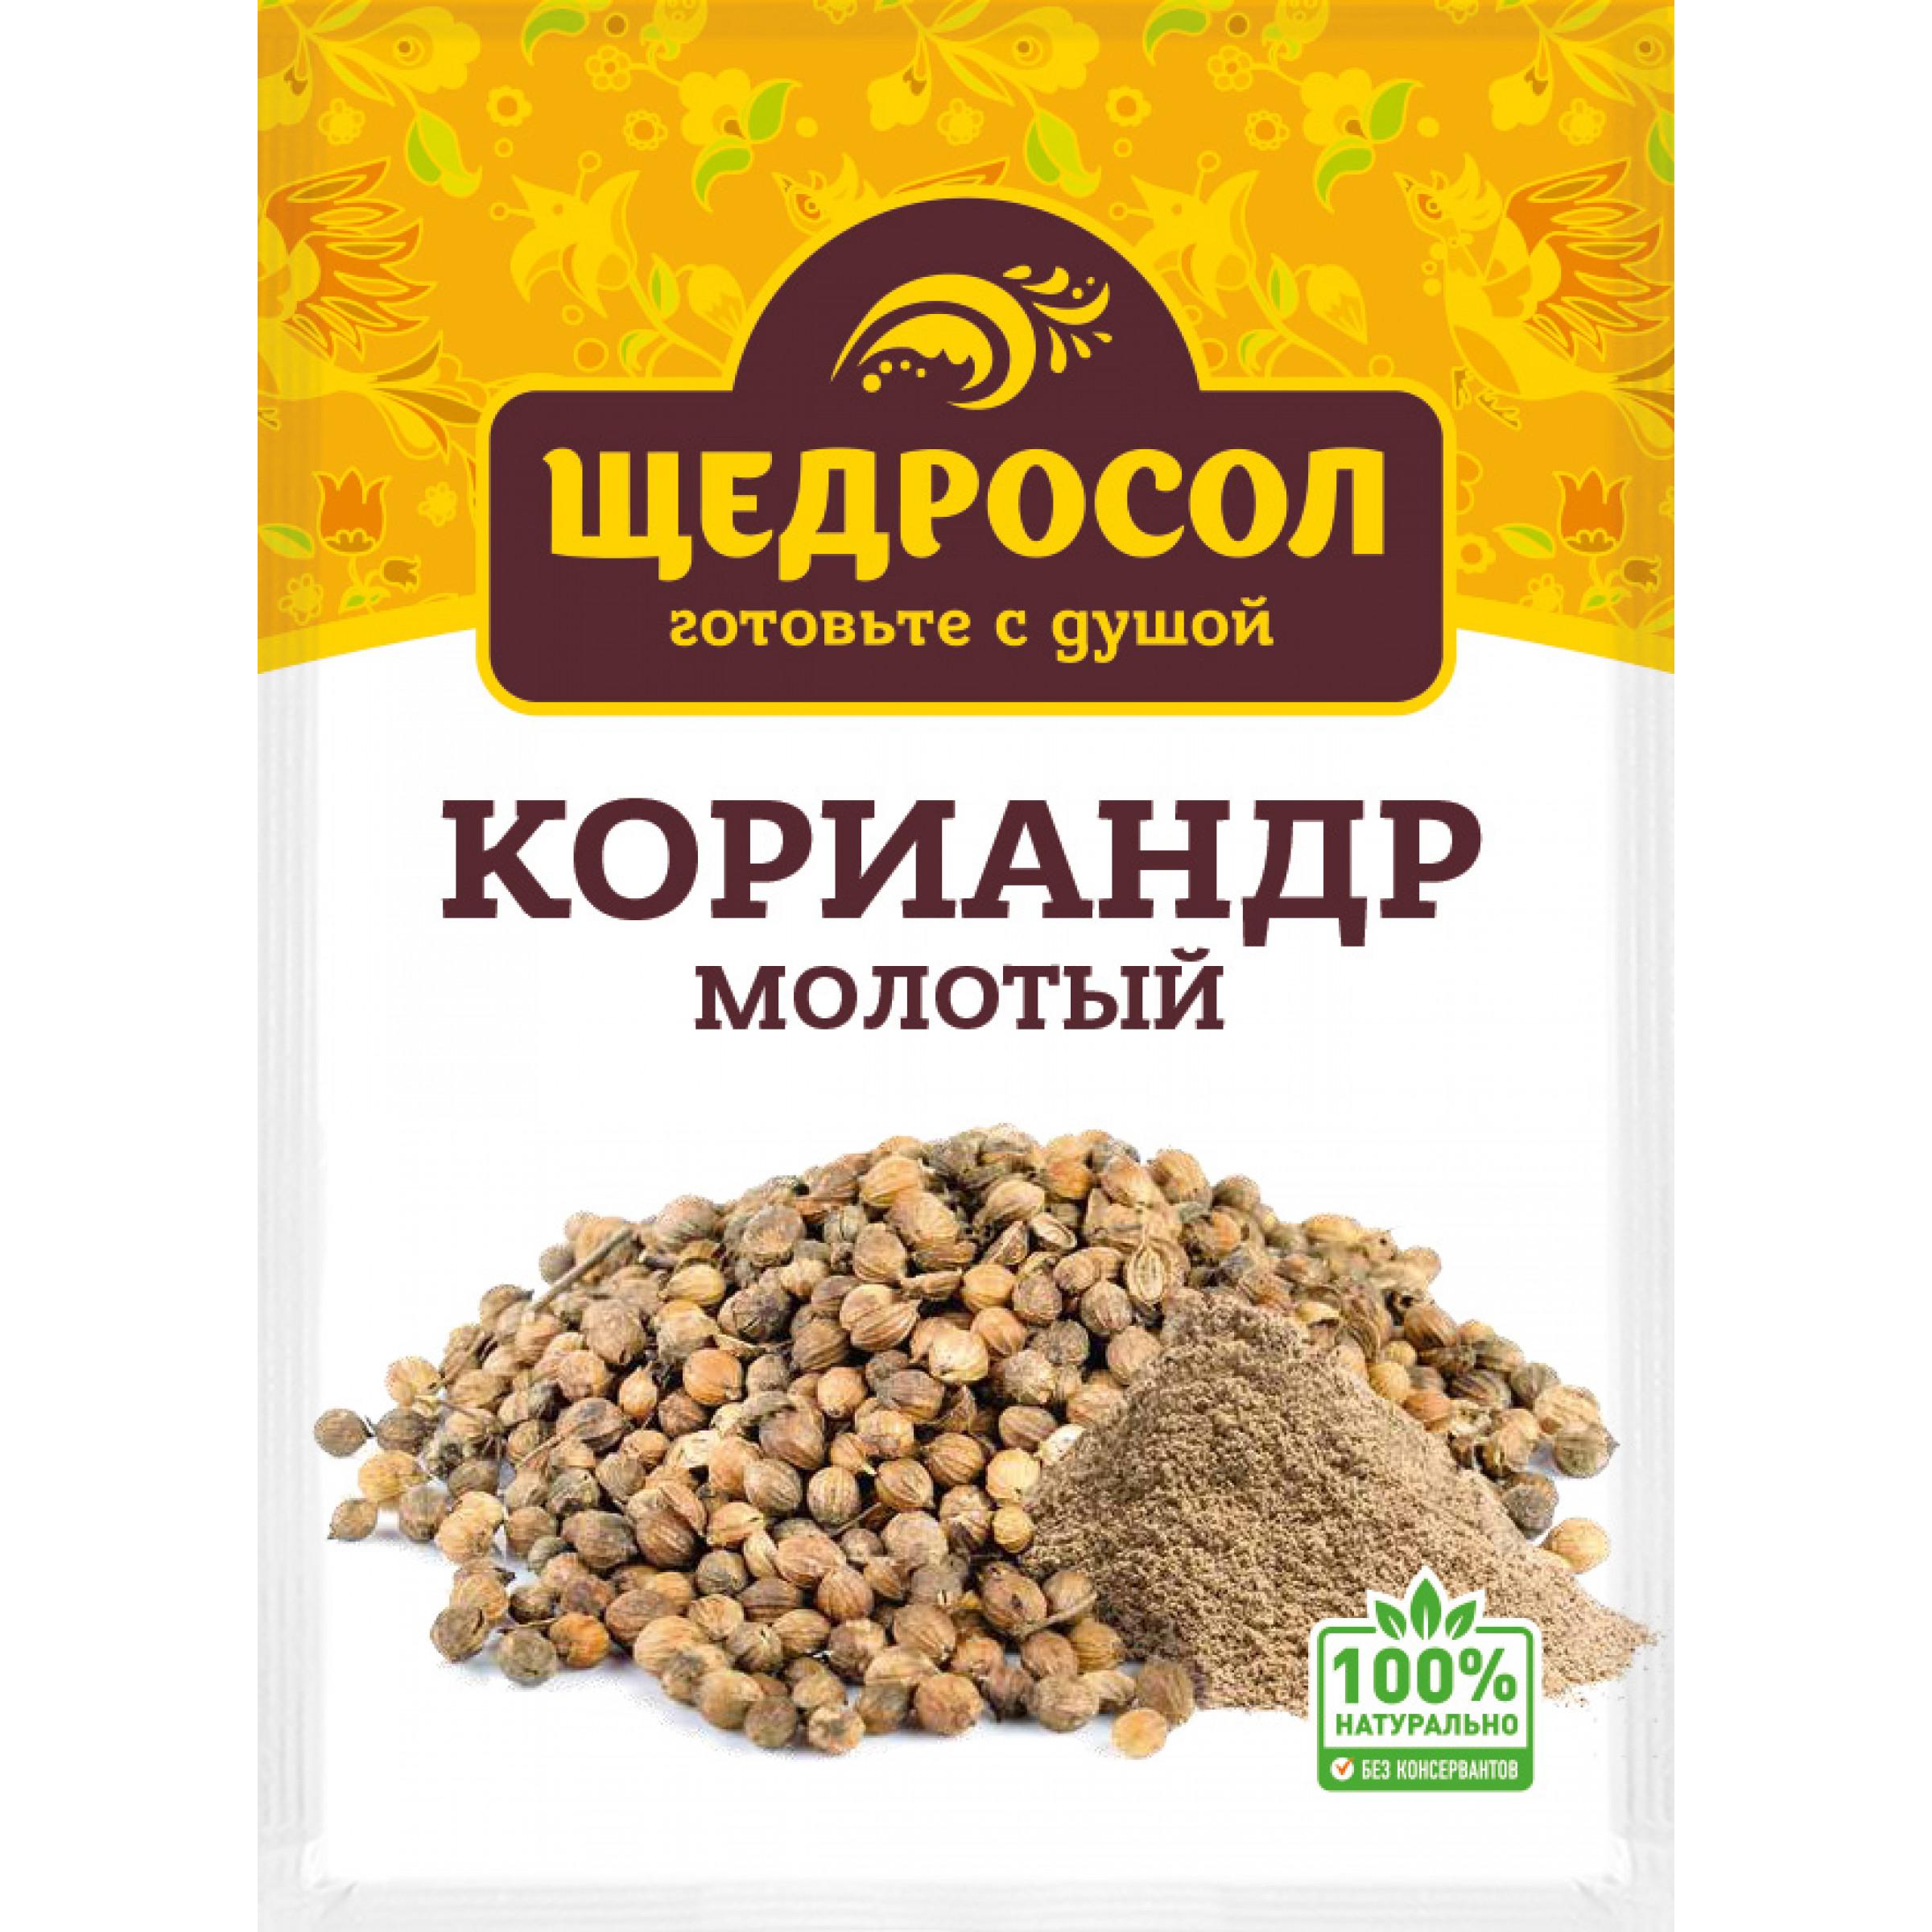 Кориандр молотый, Щедросол, 10 гр